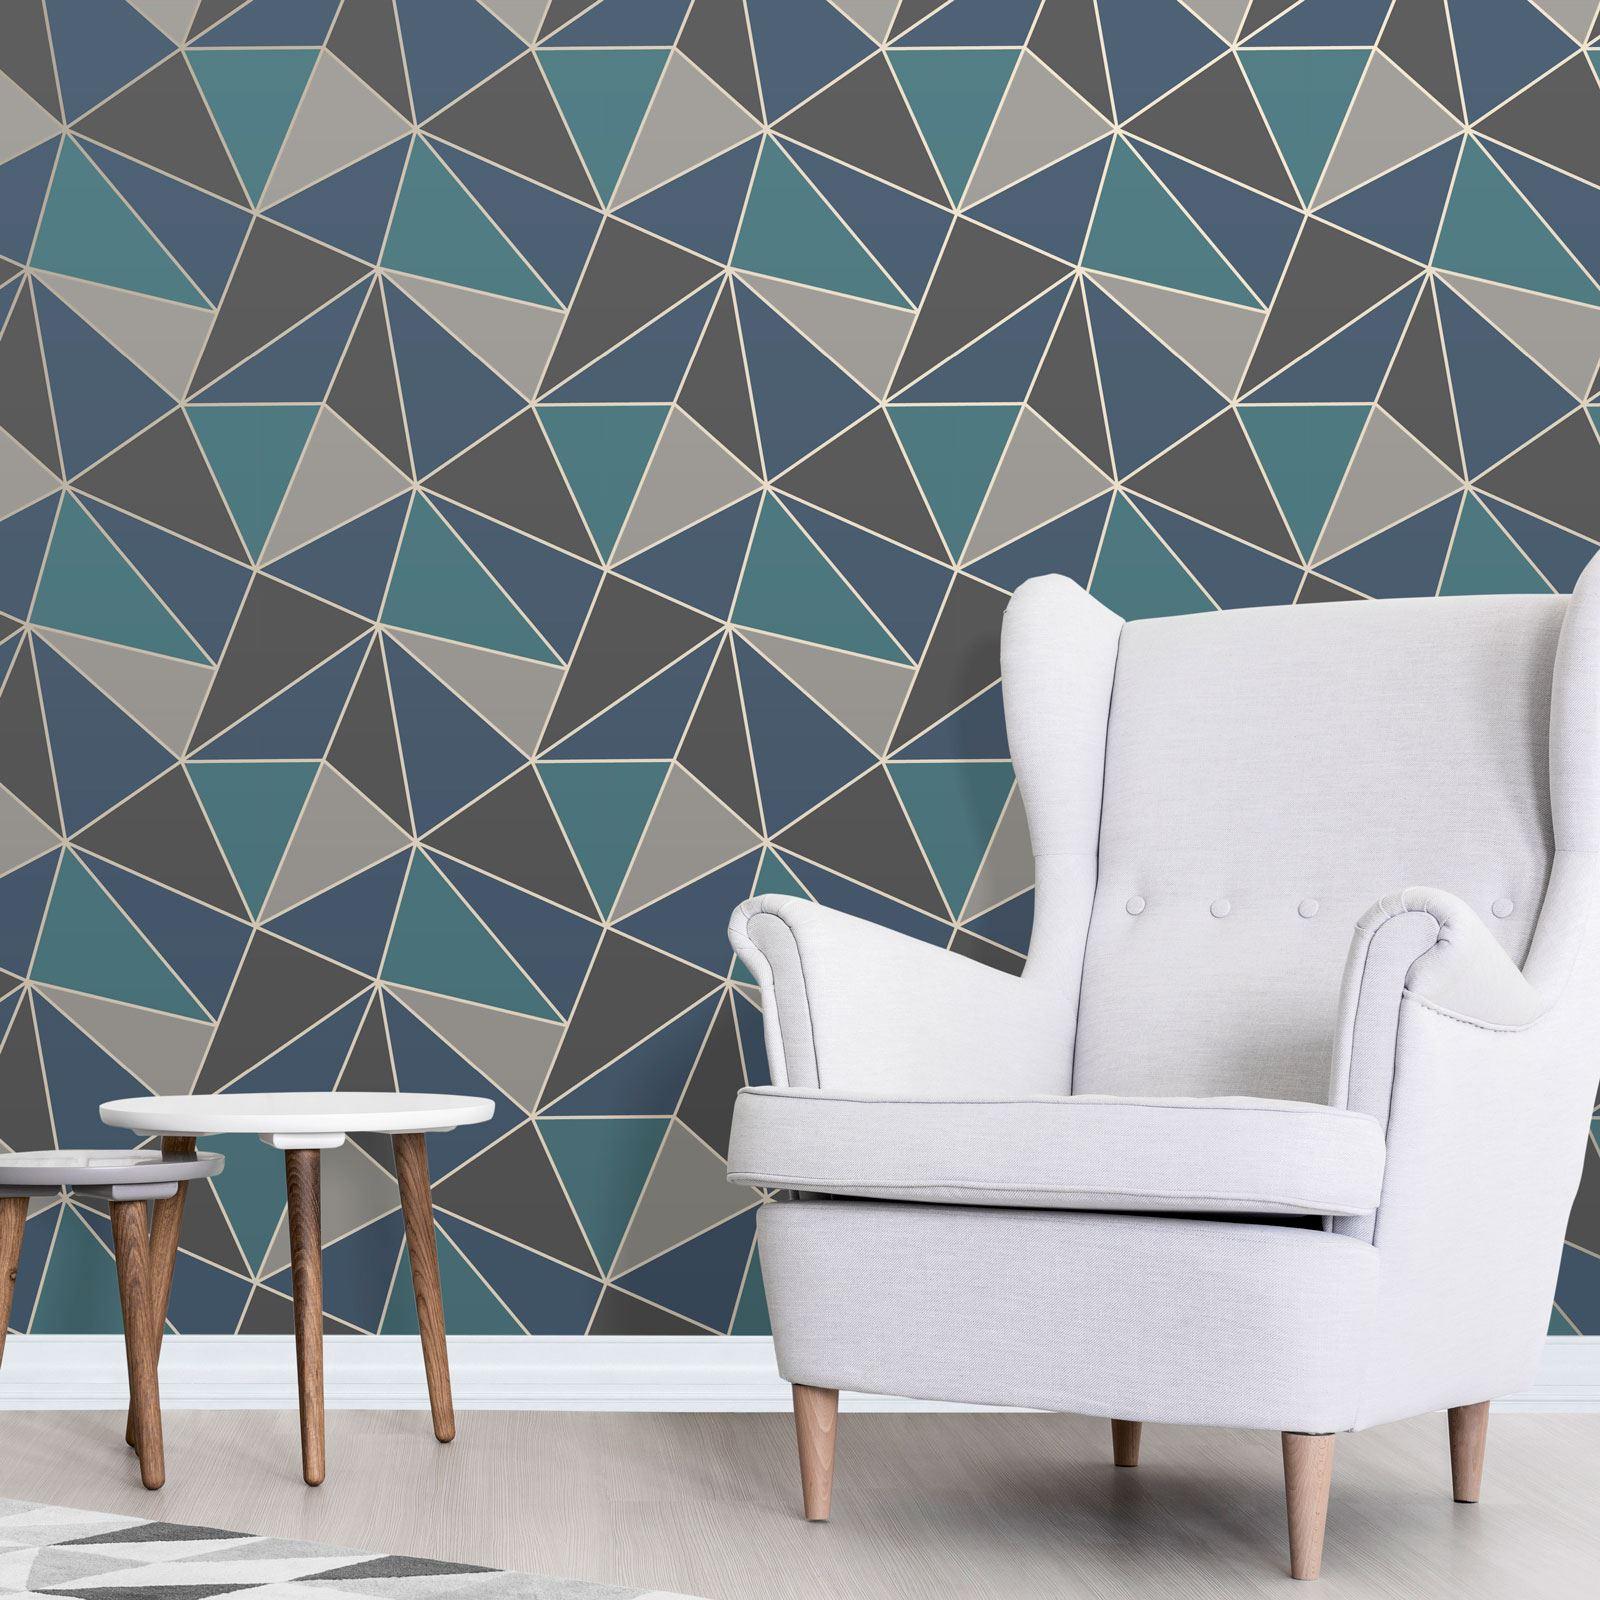 Trellis Wallpaper Metallic: GEOMETRIC WALLPAPER MODERN DECOR TRIANGLES TRELLIS SILVER